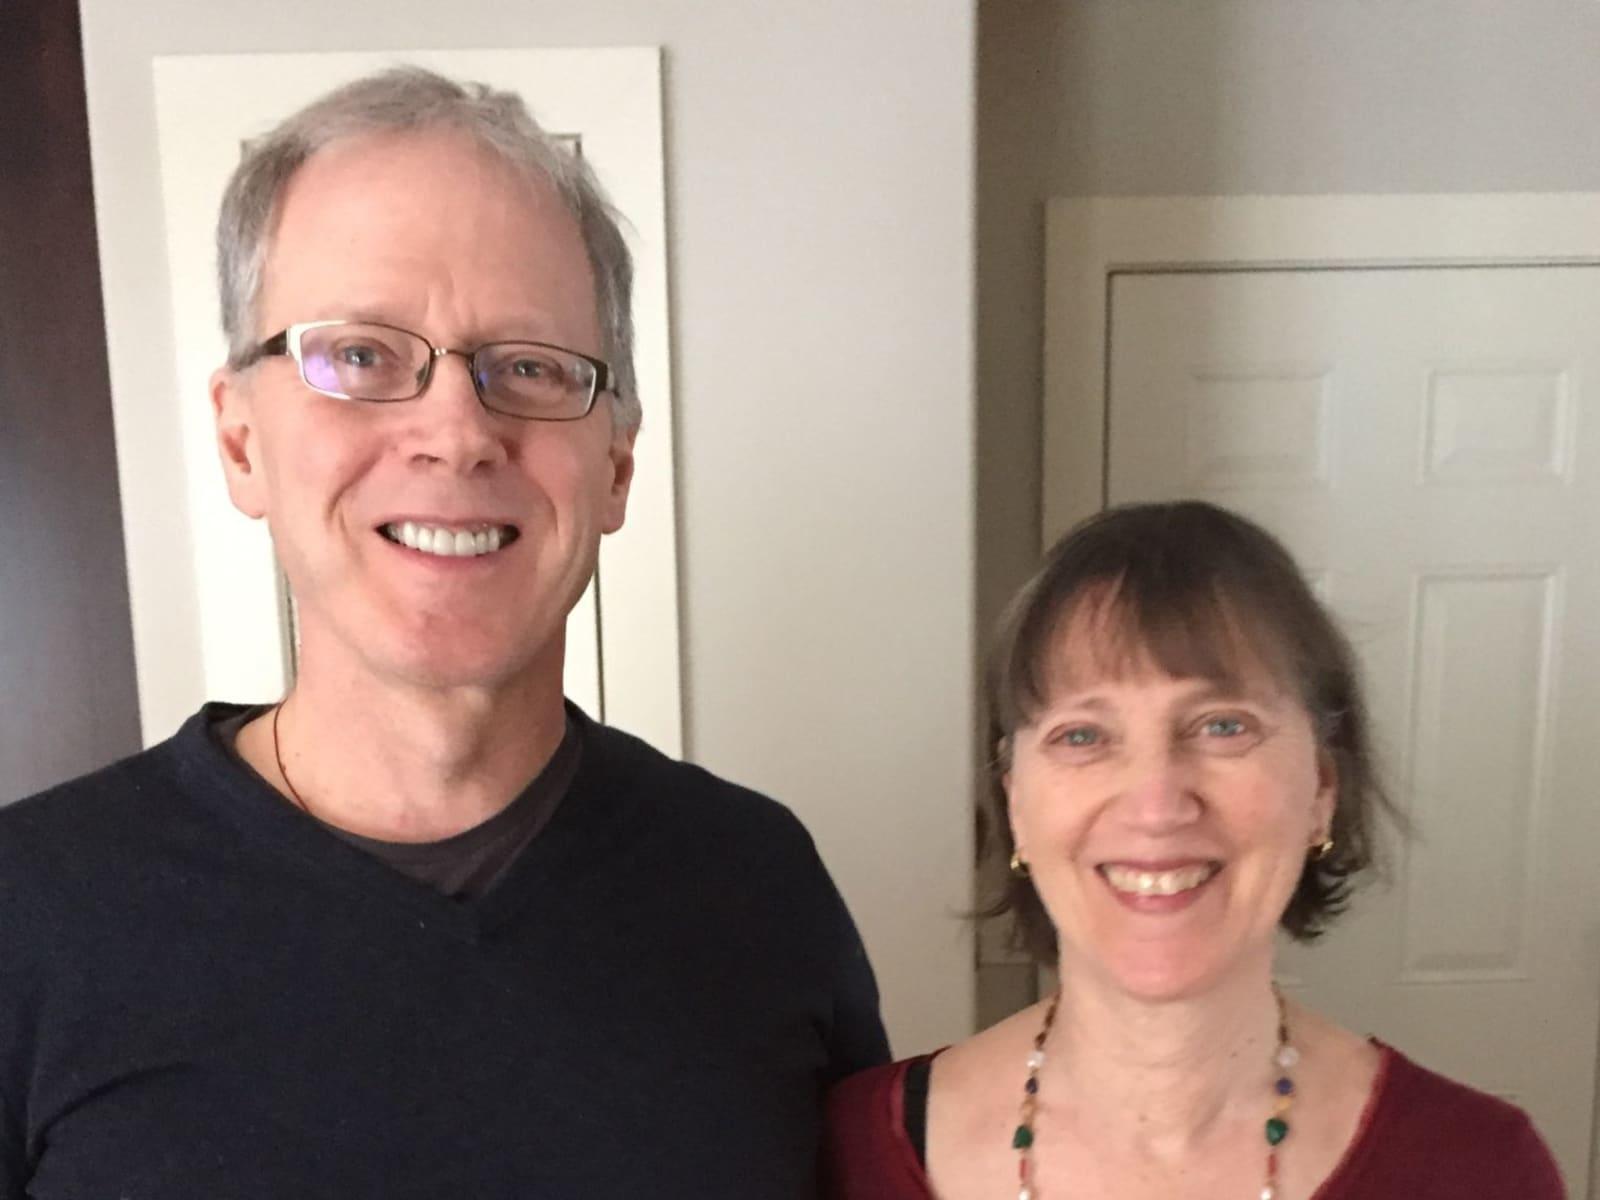 Andrew & Wendy from Halifax, Nova Scotia, Canada